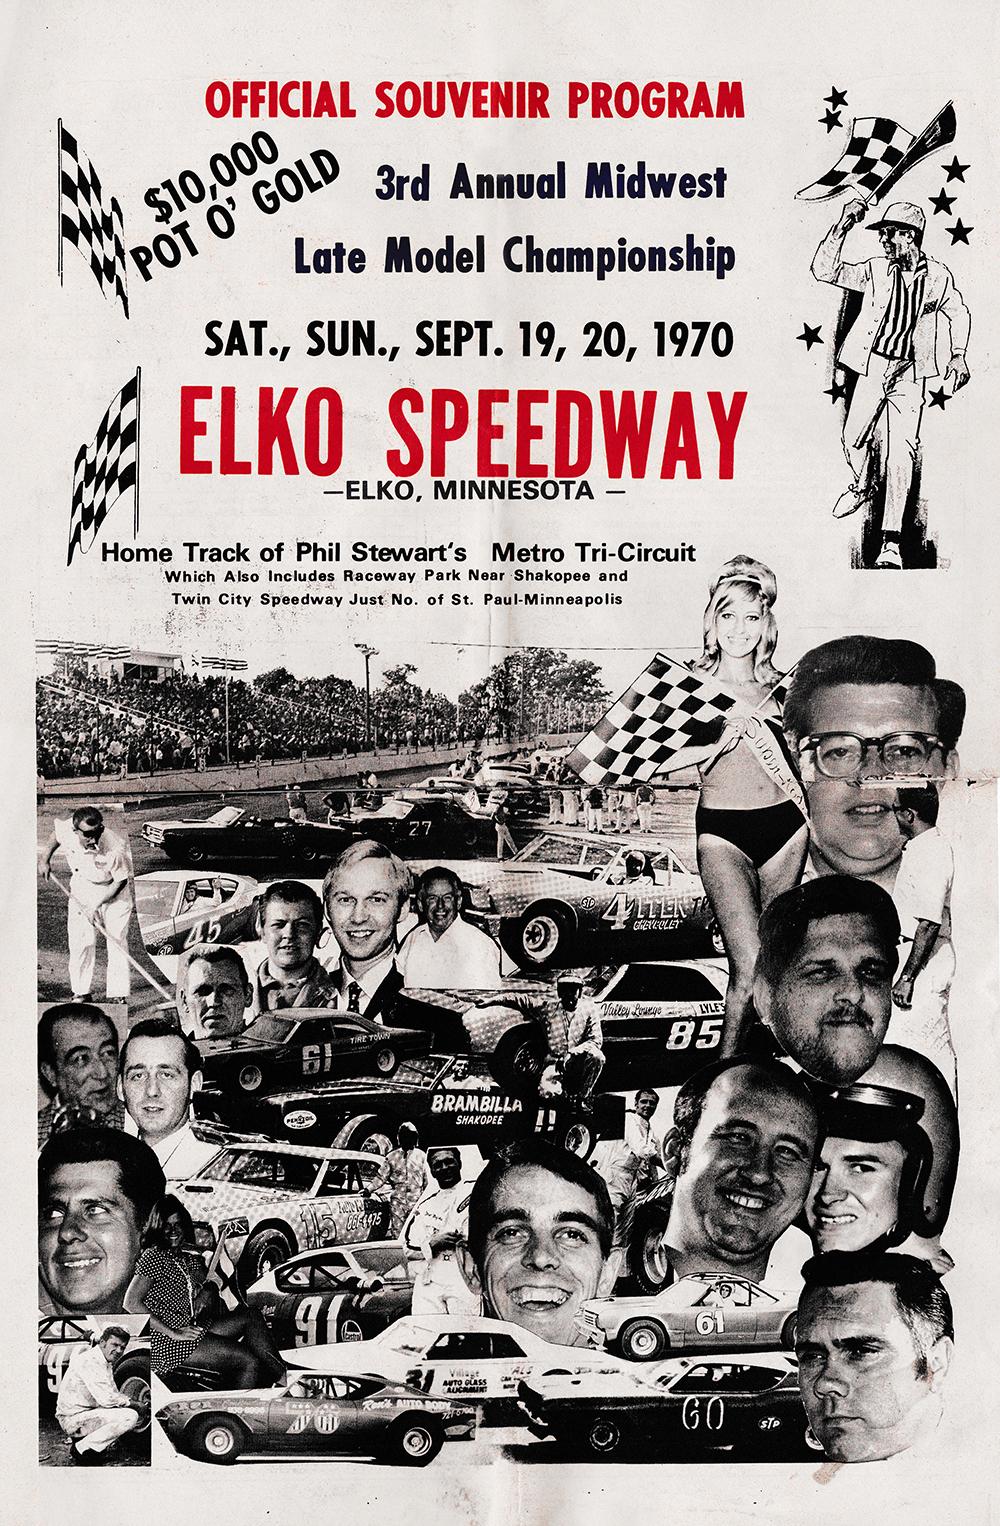 Elko-1971-Souvenir-web